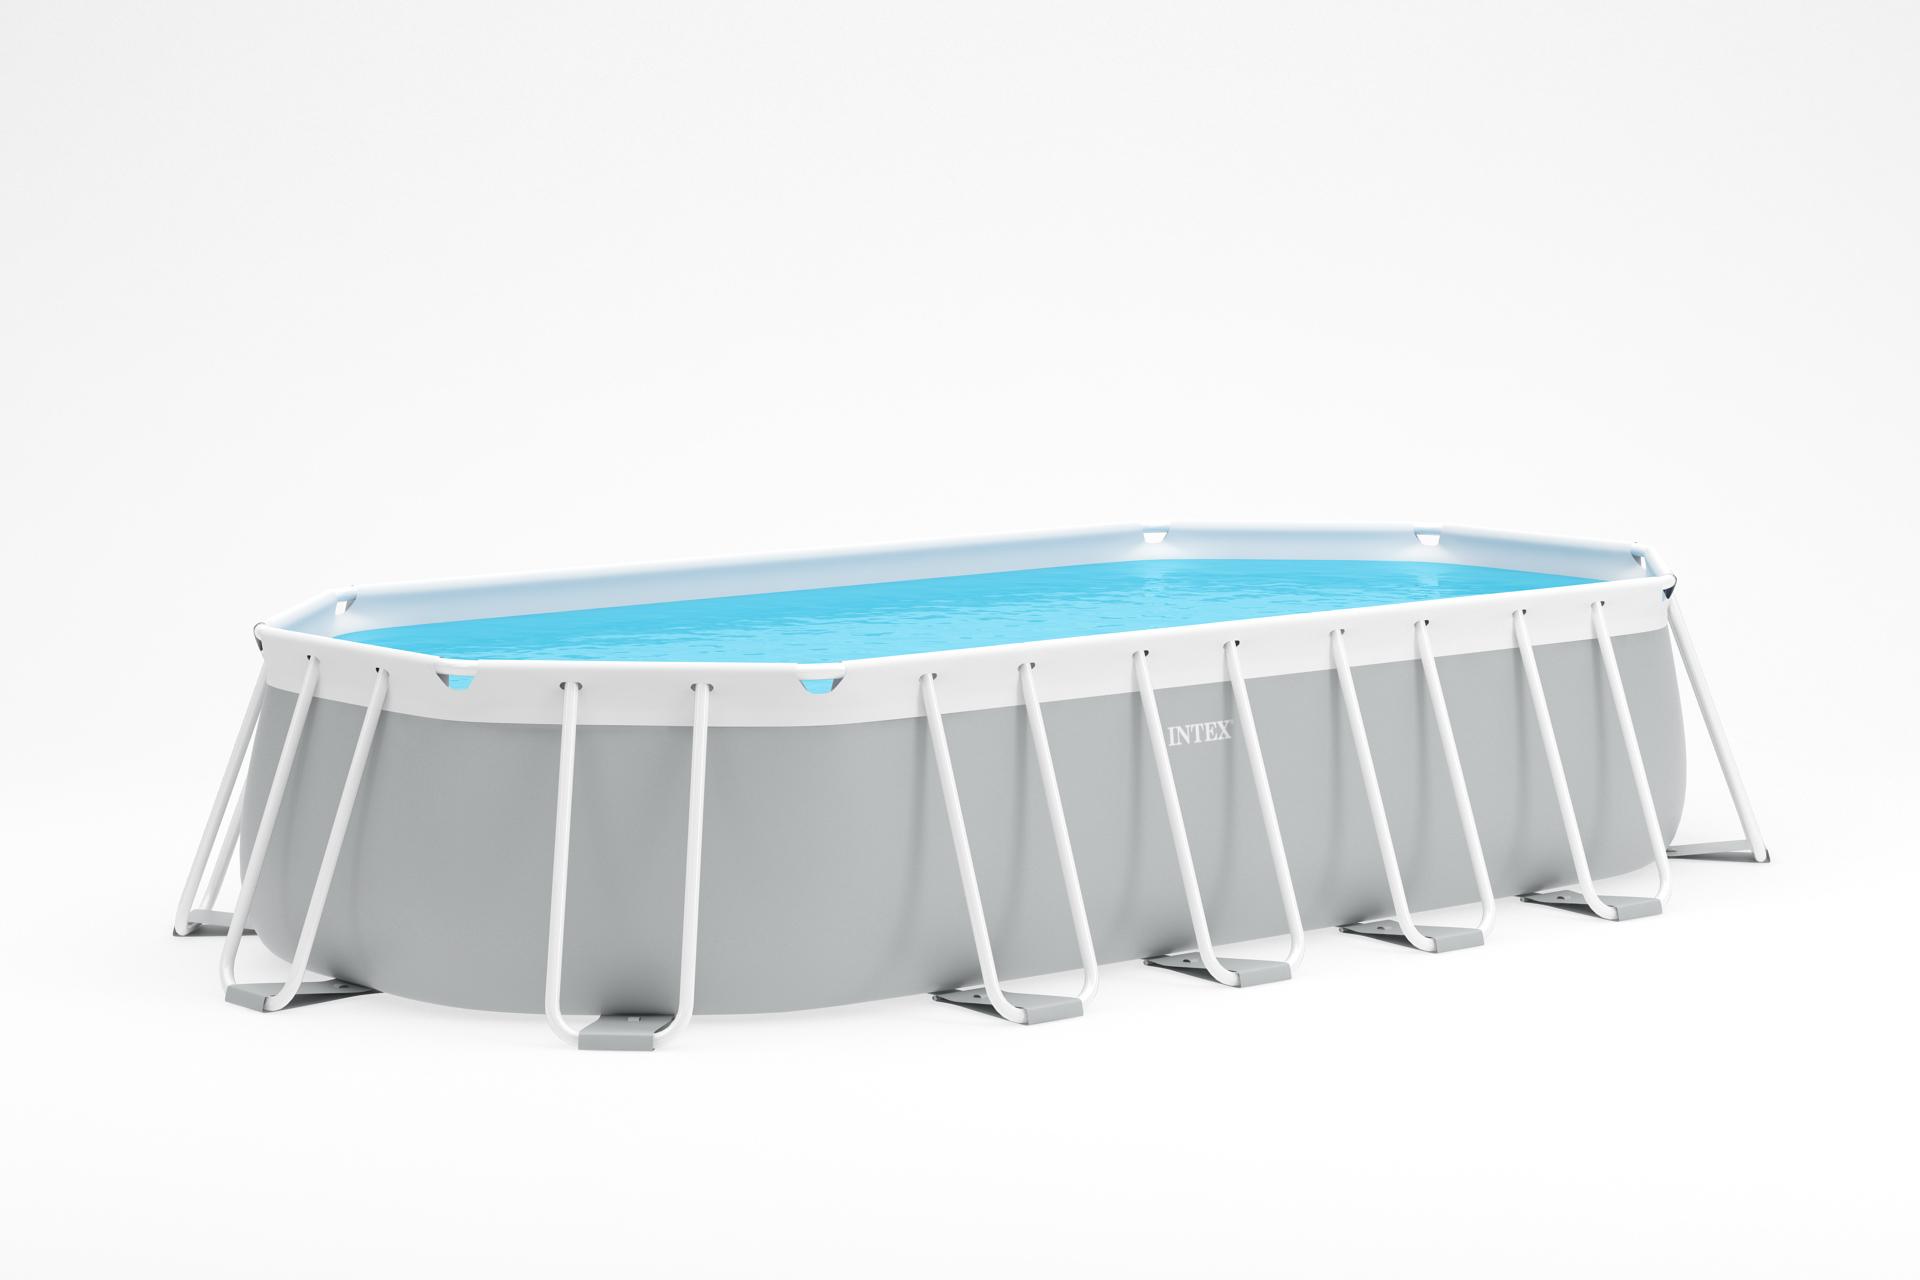 INTEX Prism Frame Oval Swimming Pool 610x305x122 cm Schwimmbecken 26798